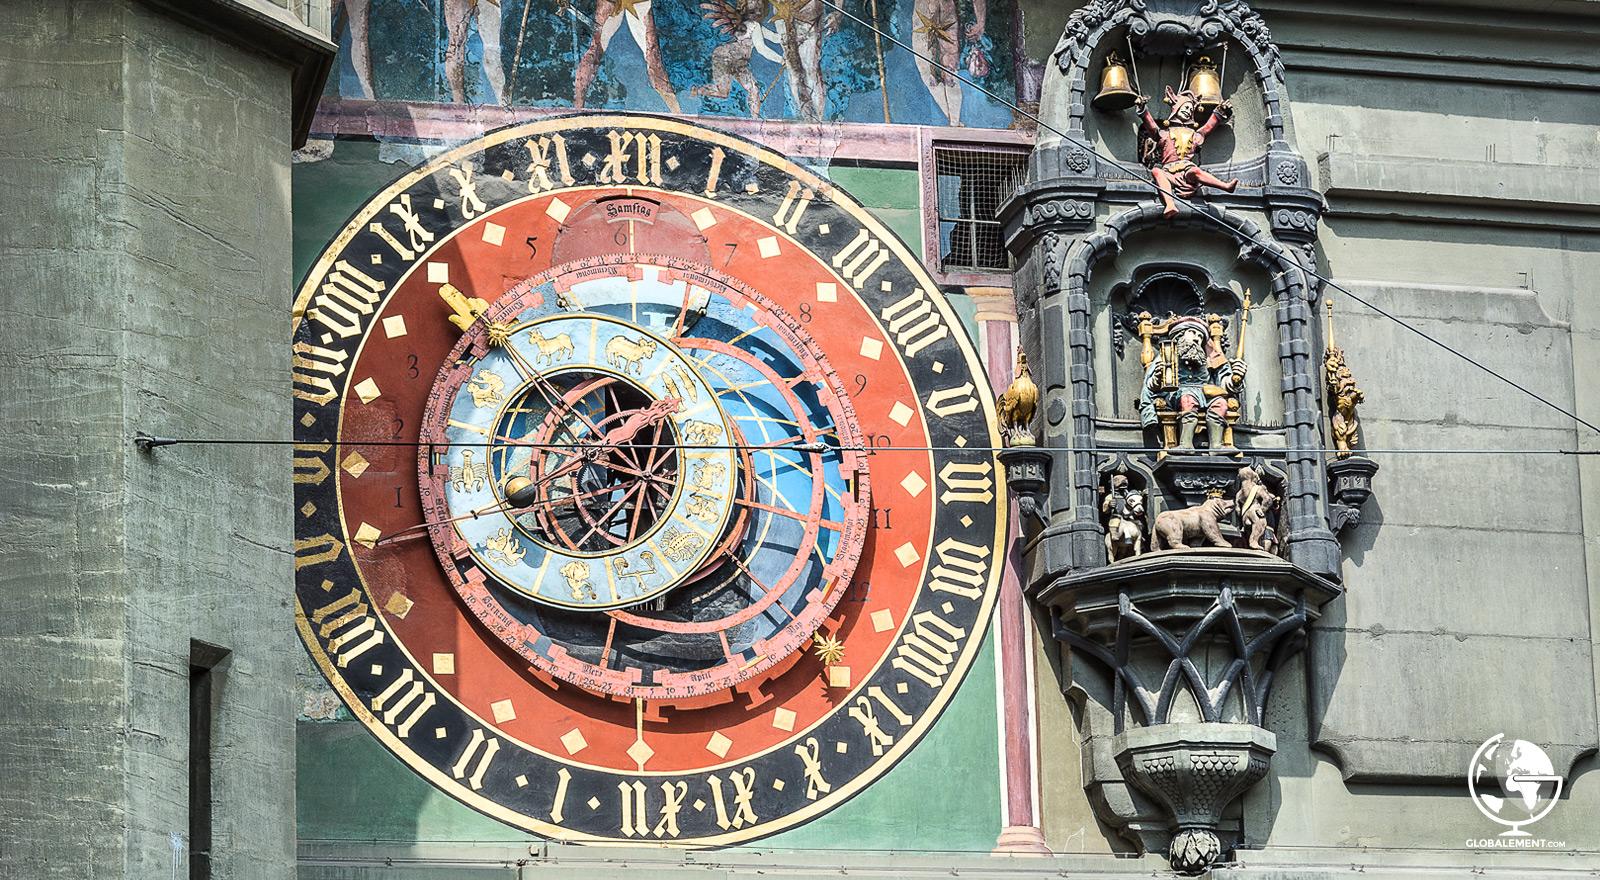 tour de l'horloge berne zytglogge